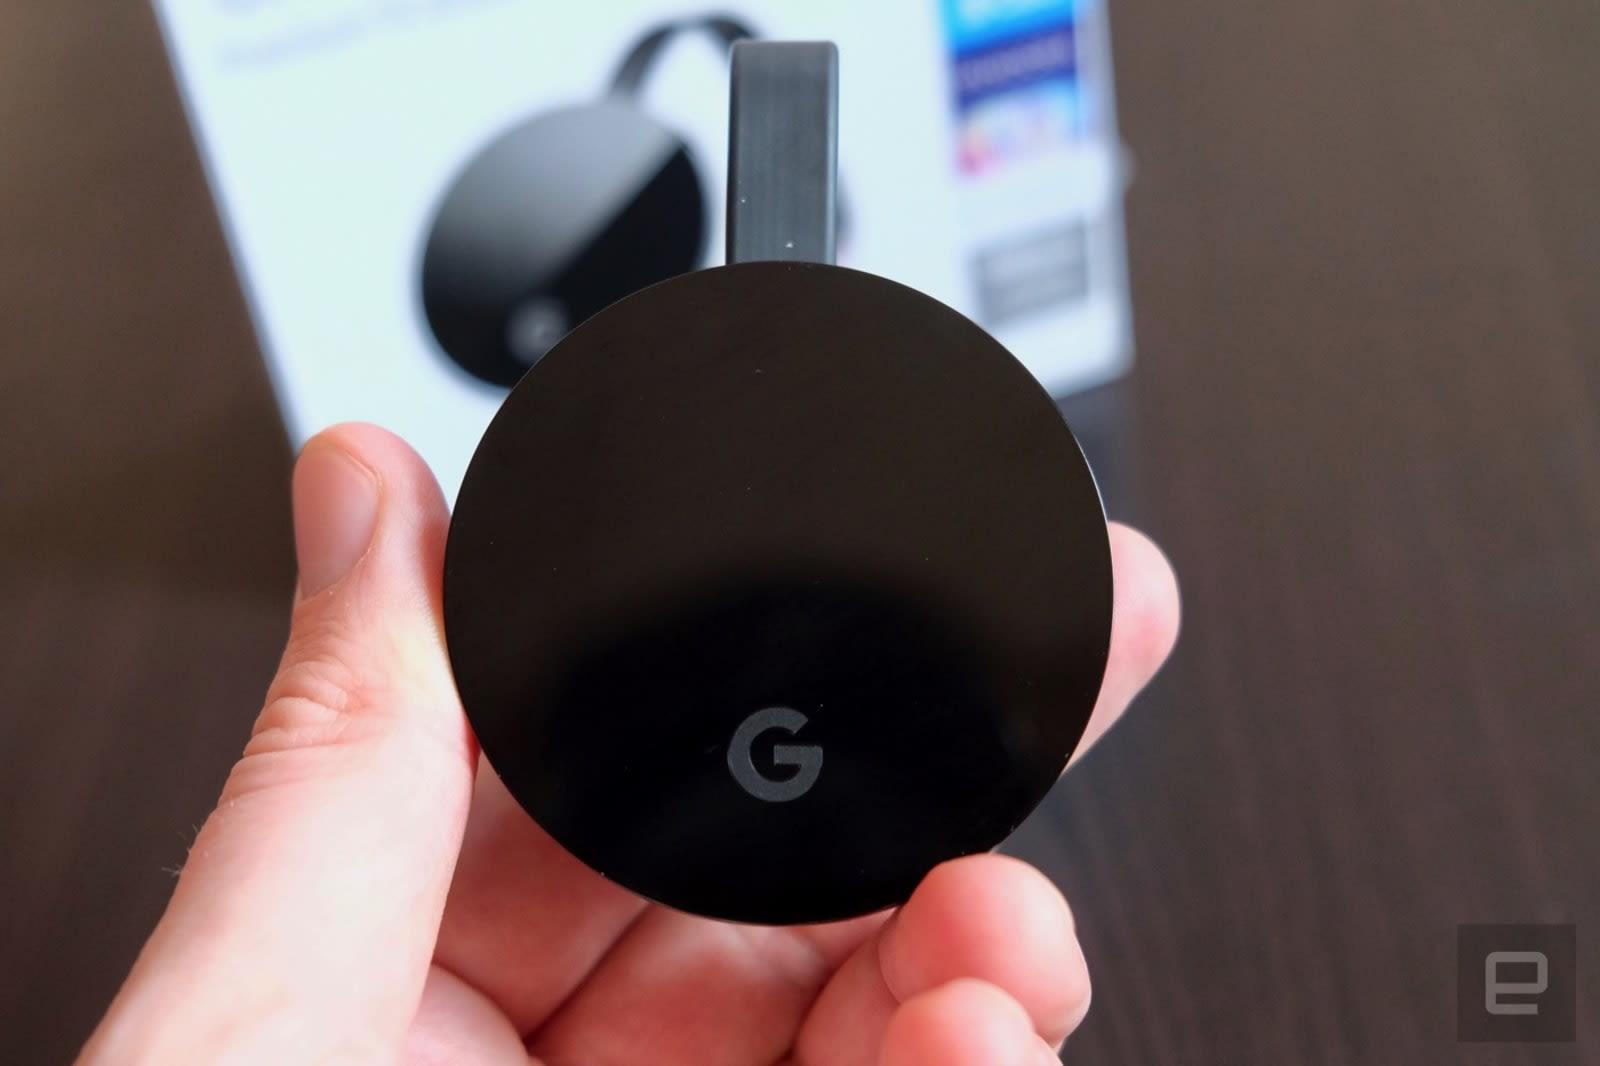 Google releases fix for Chromecast WiFi bug